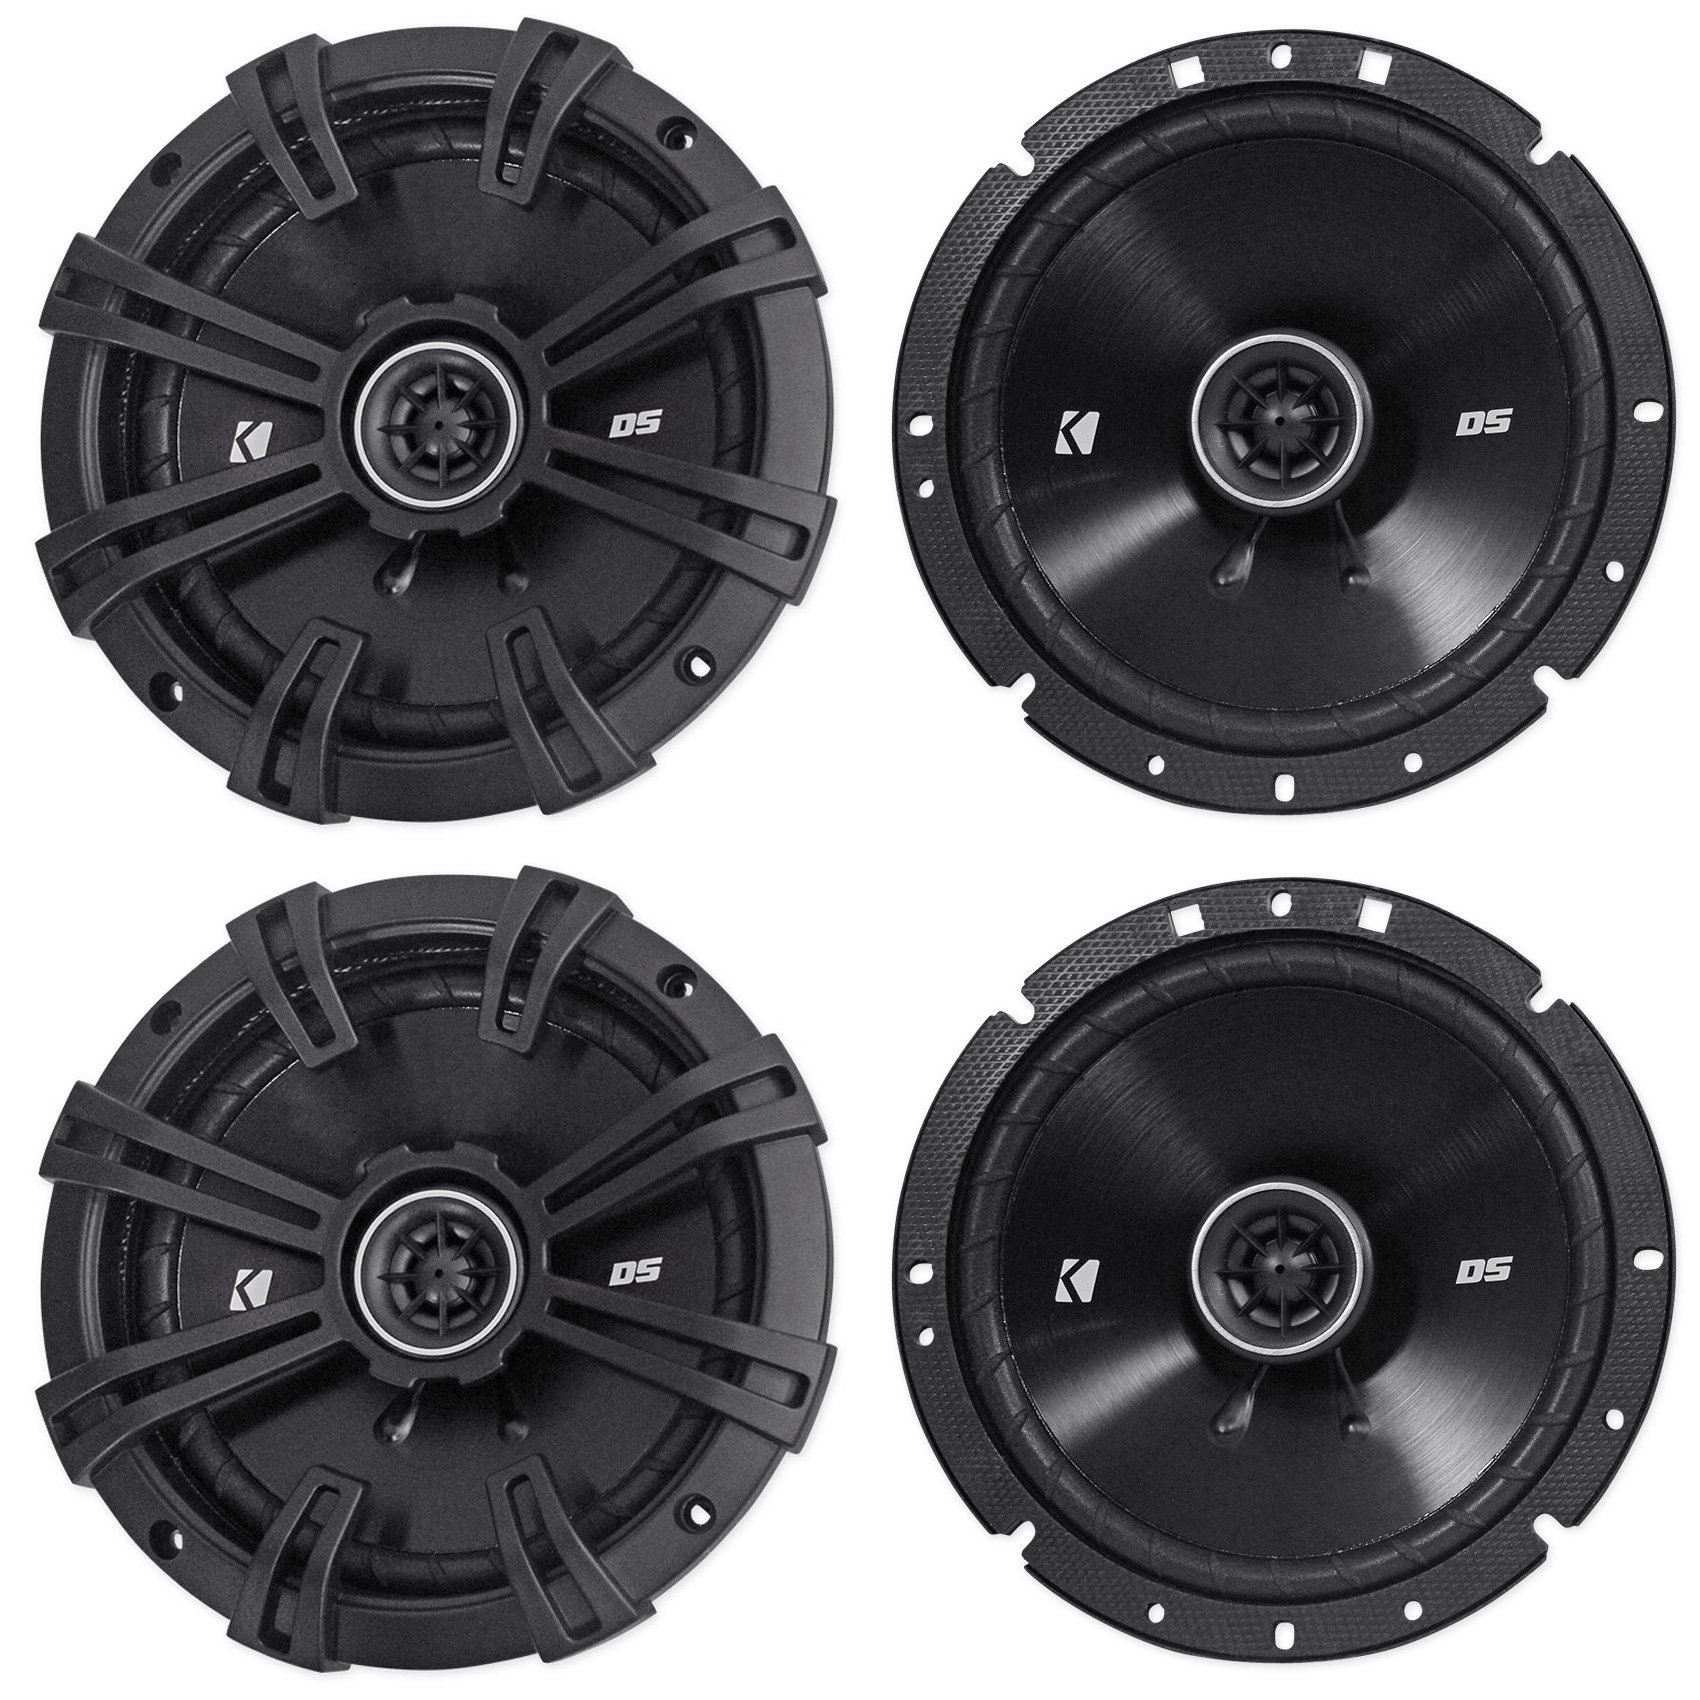 (2) Pairs of Kicker 43DSC6704 DSC670 6.75'' 2-Way Car Audio Speakers Totaling 480 Watt 4-Ohm With Zero Protrusion Tweeters